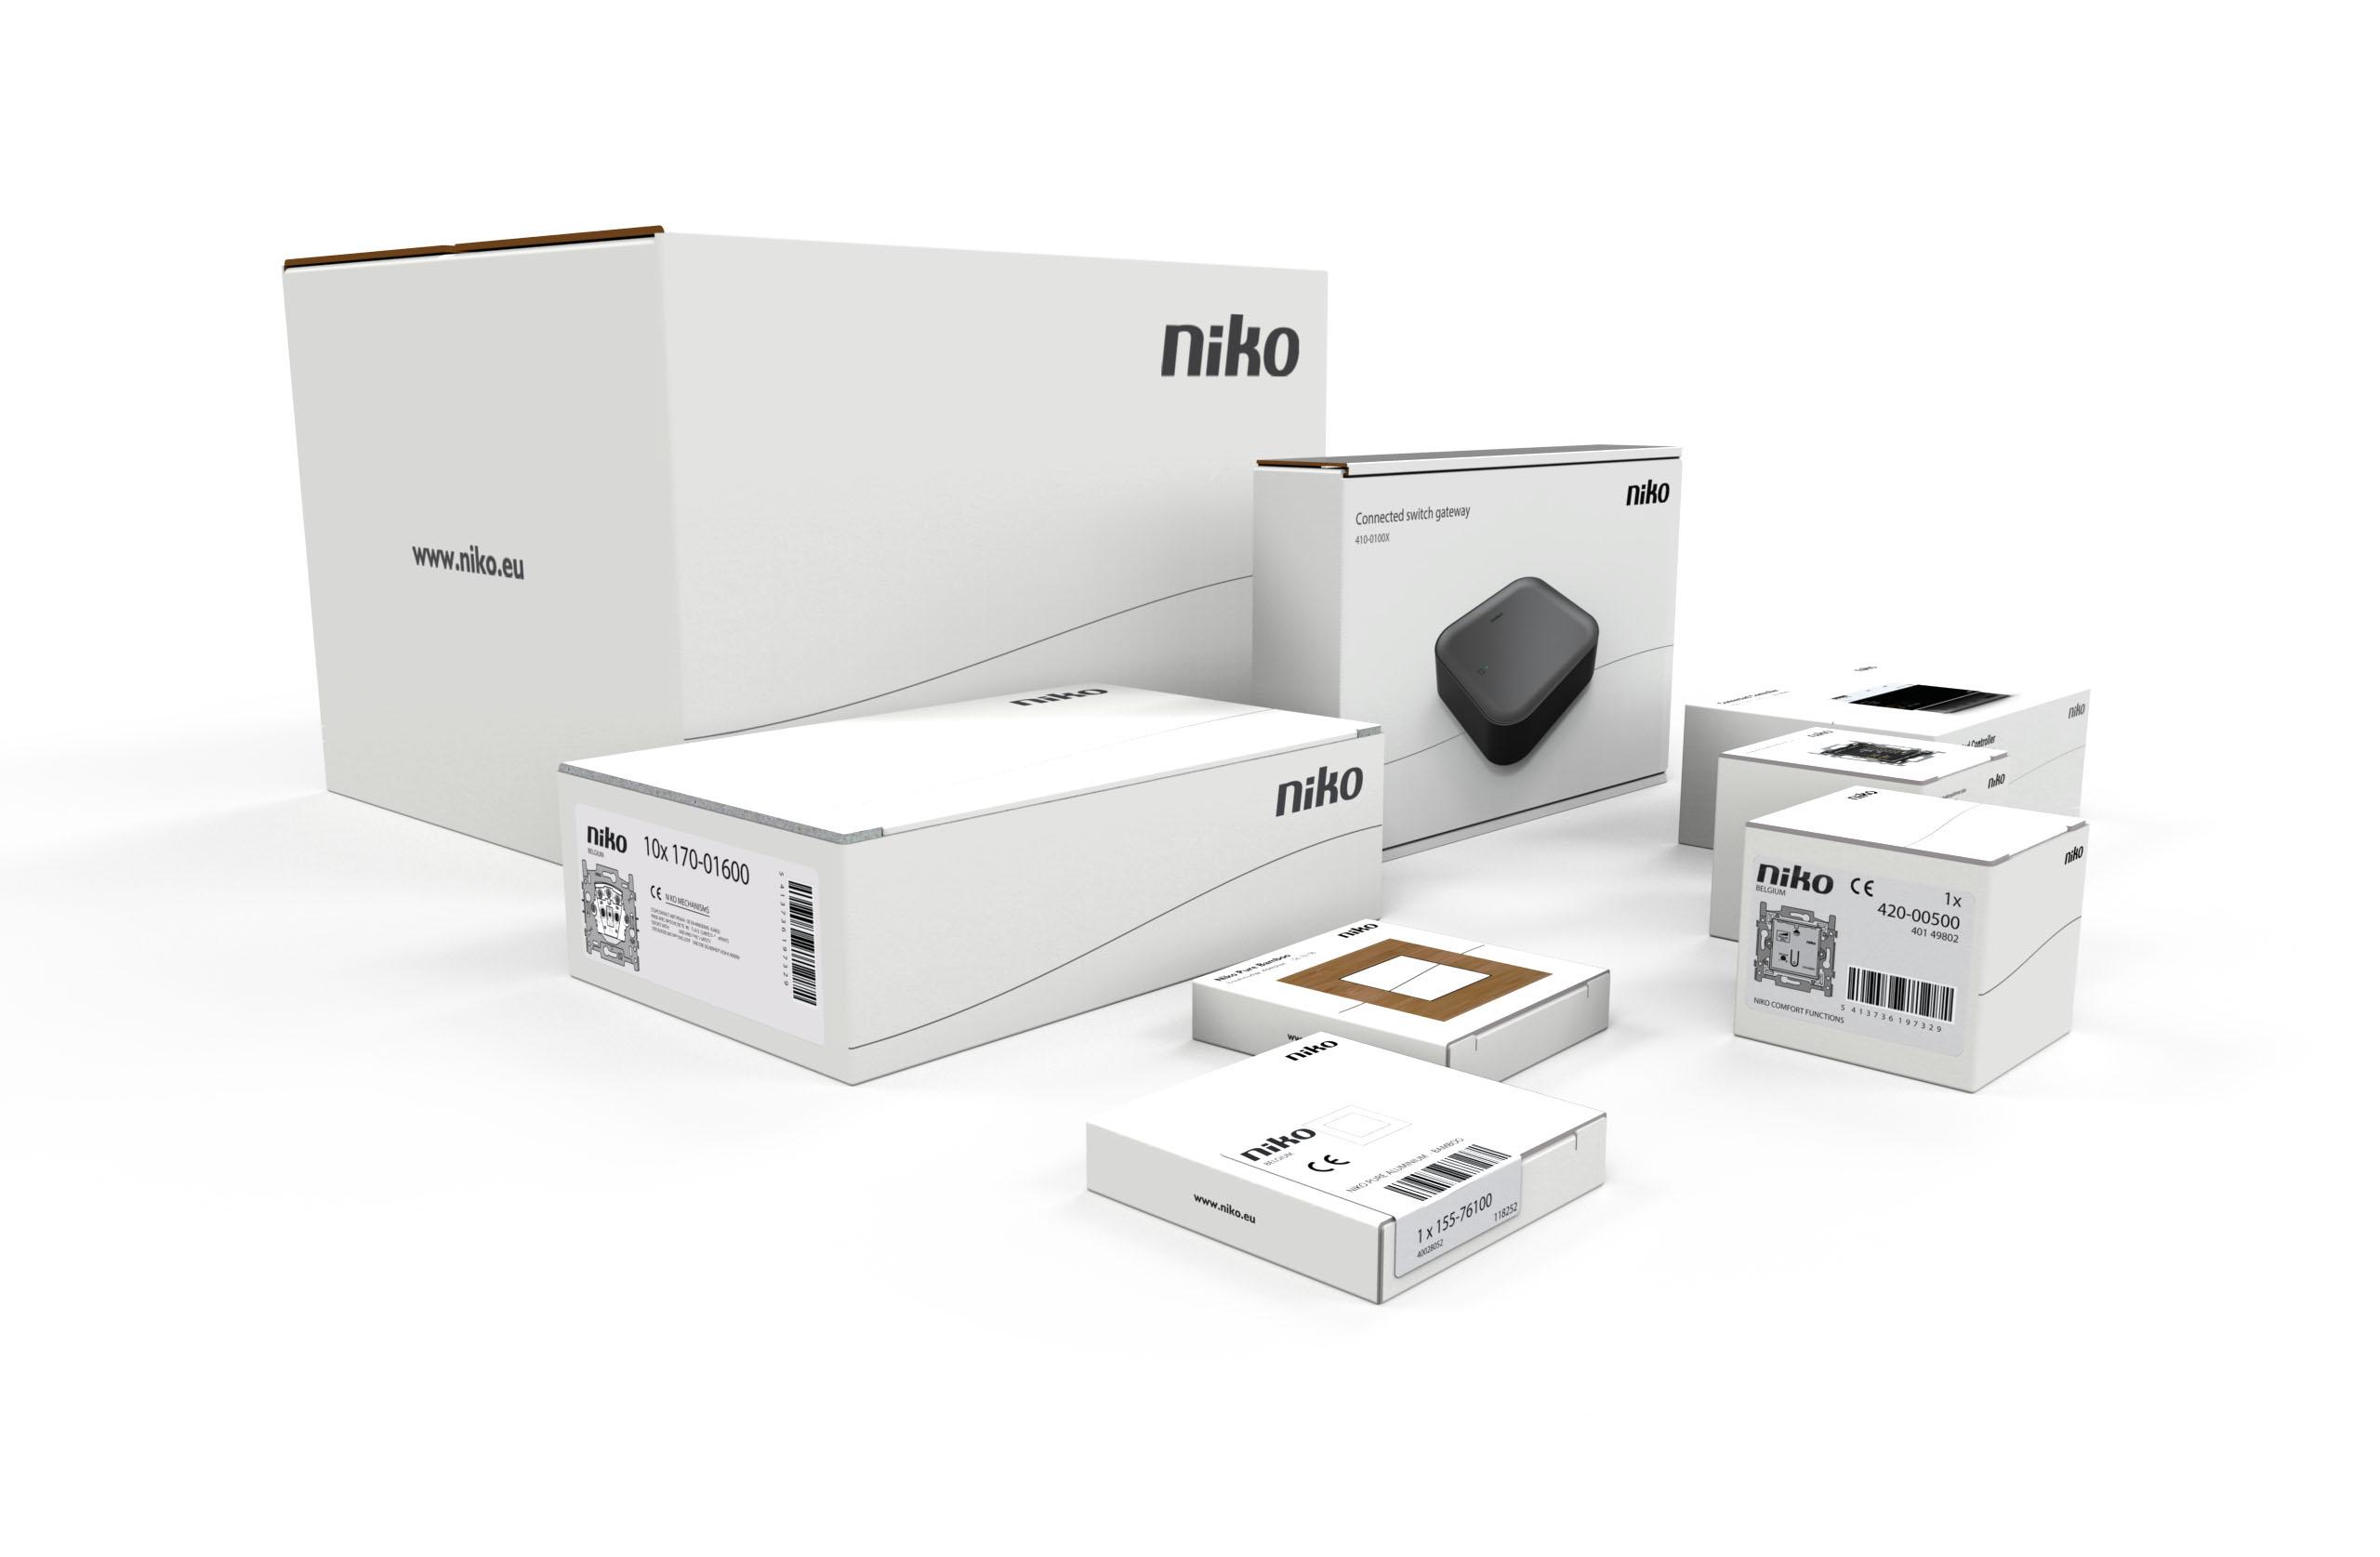 verzameling corporate packaging